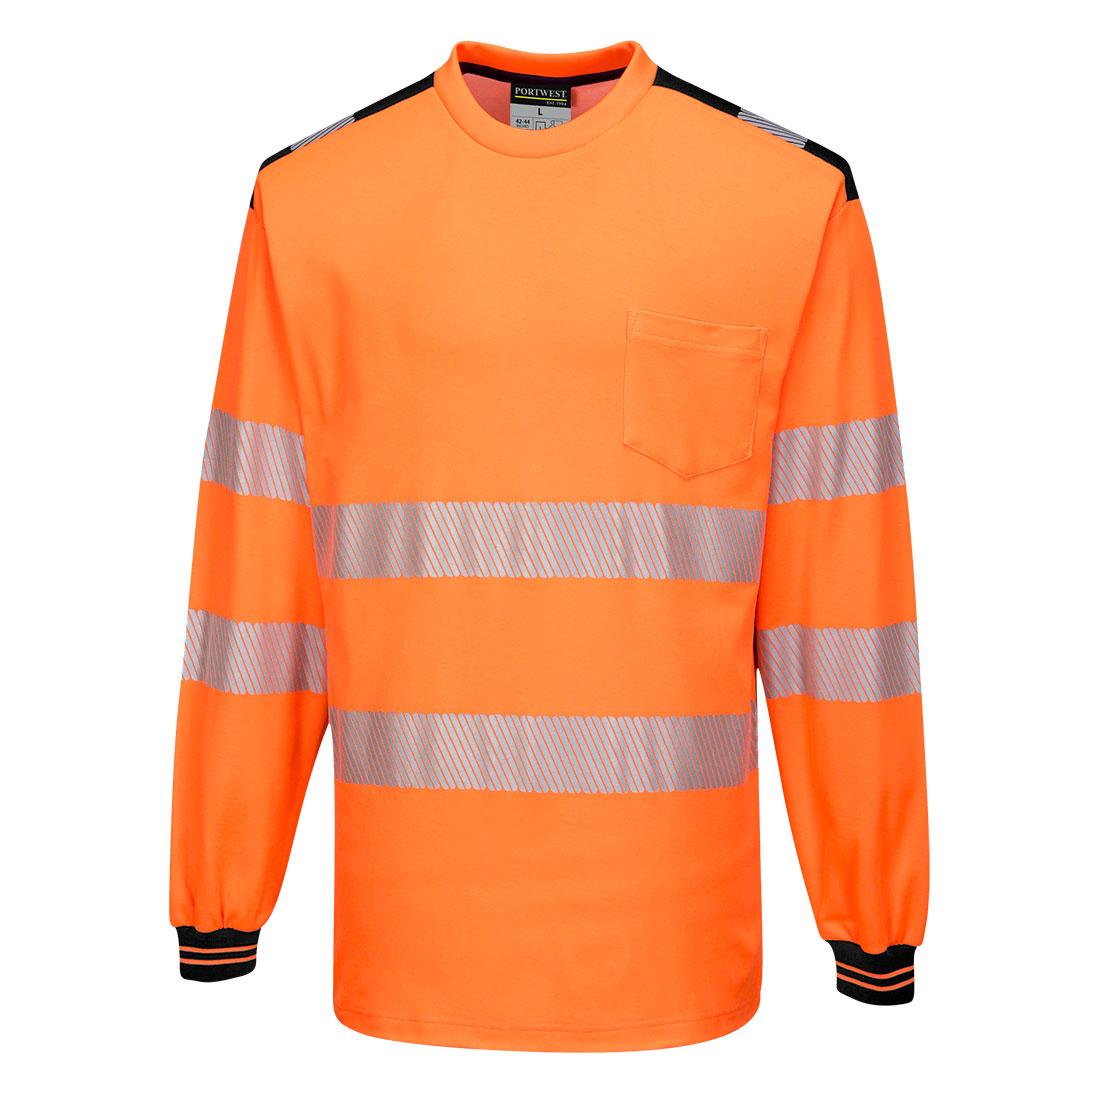 PW3 Hi-Vis T-Shirt  L/S Orange/Black SR